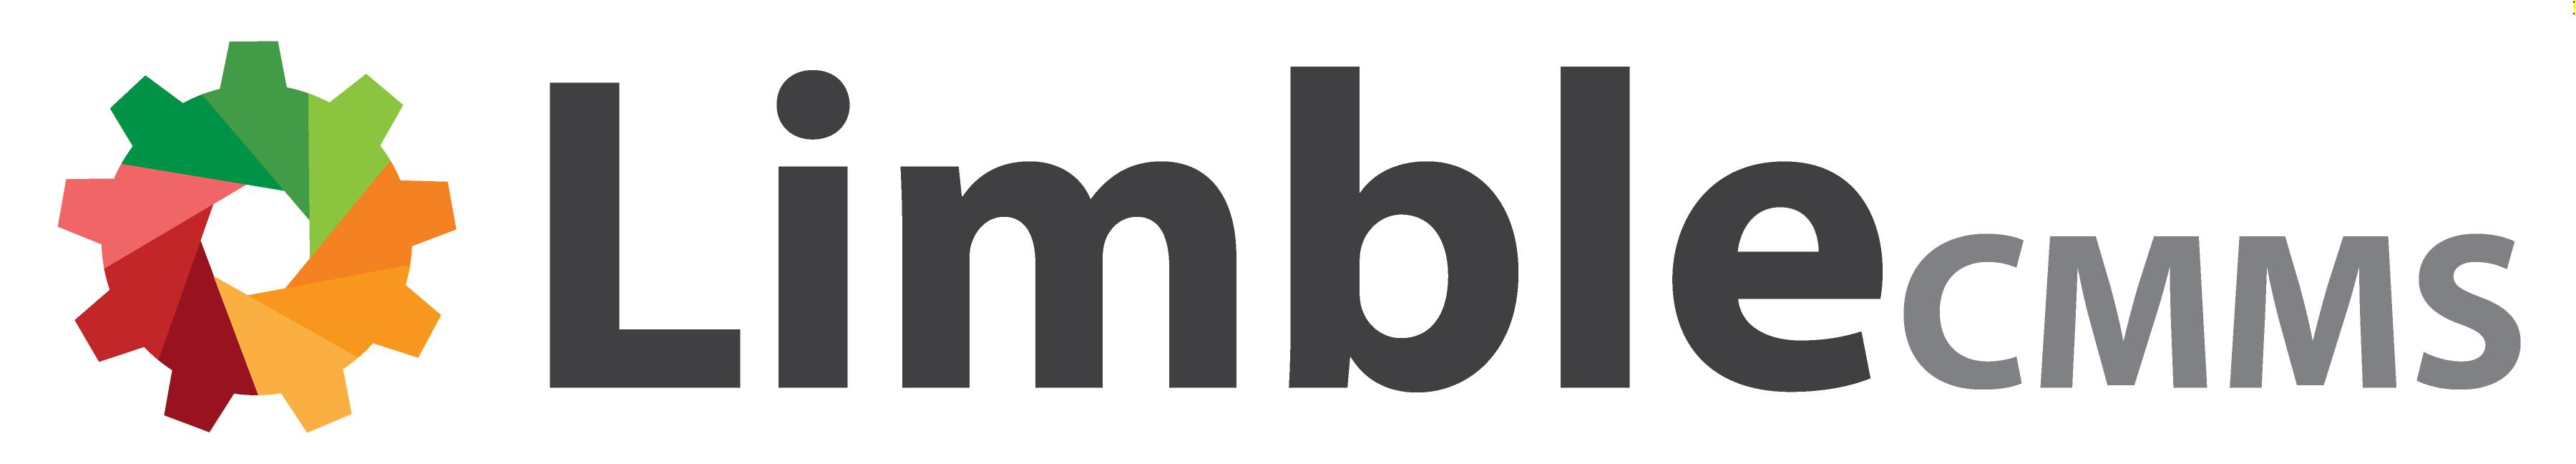 Limble CMMS ซอฟต์แวร์บริหารอาคารและซ่อมบำรุง